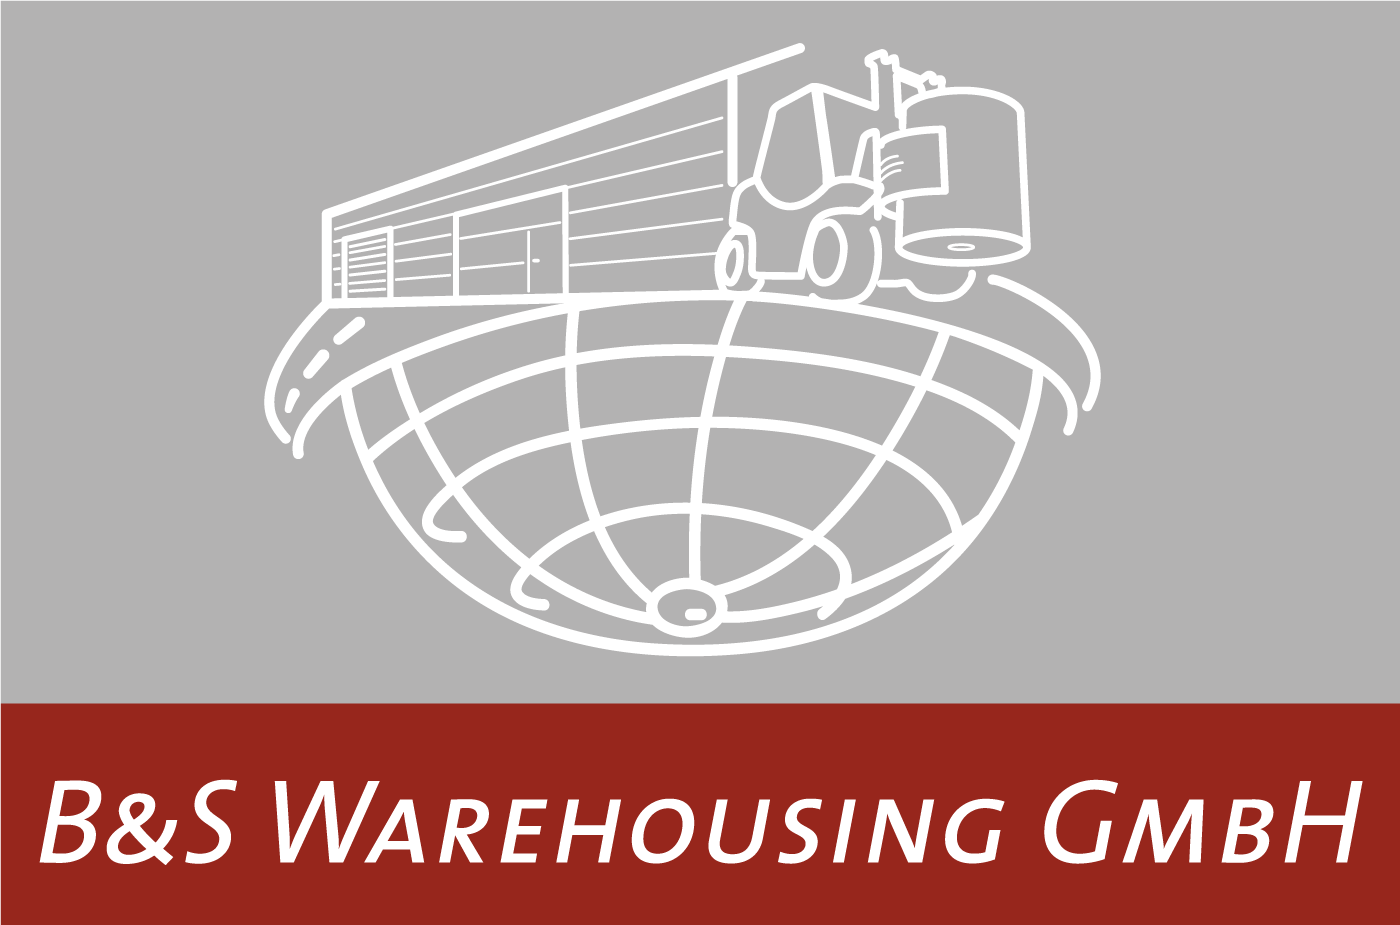 bs-logo-warehousing